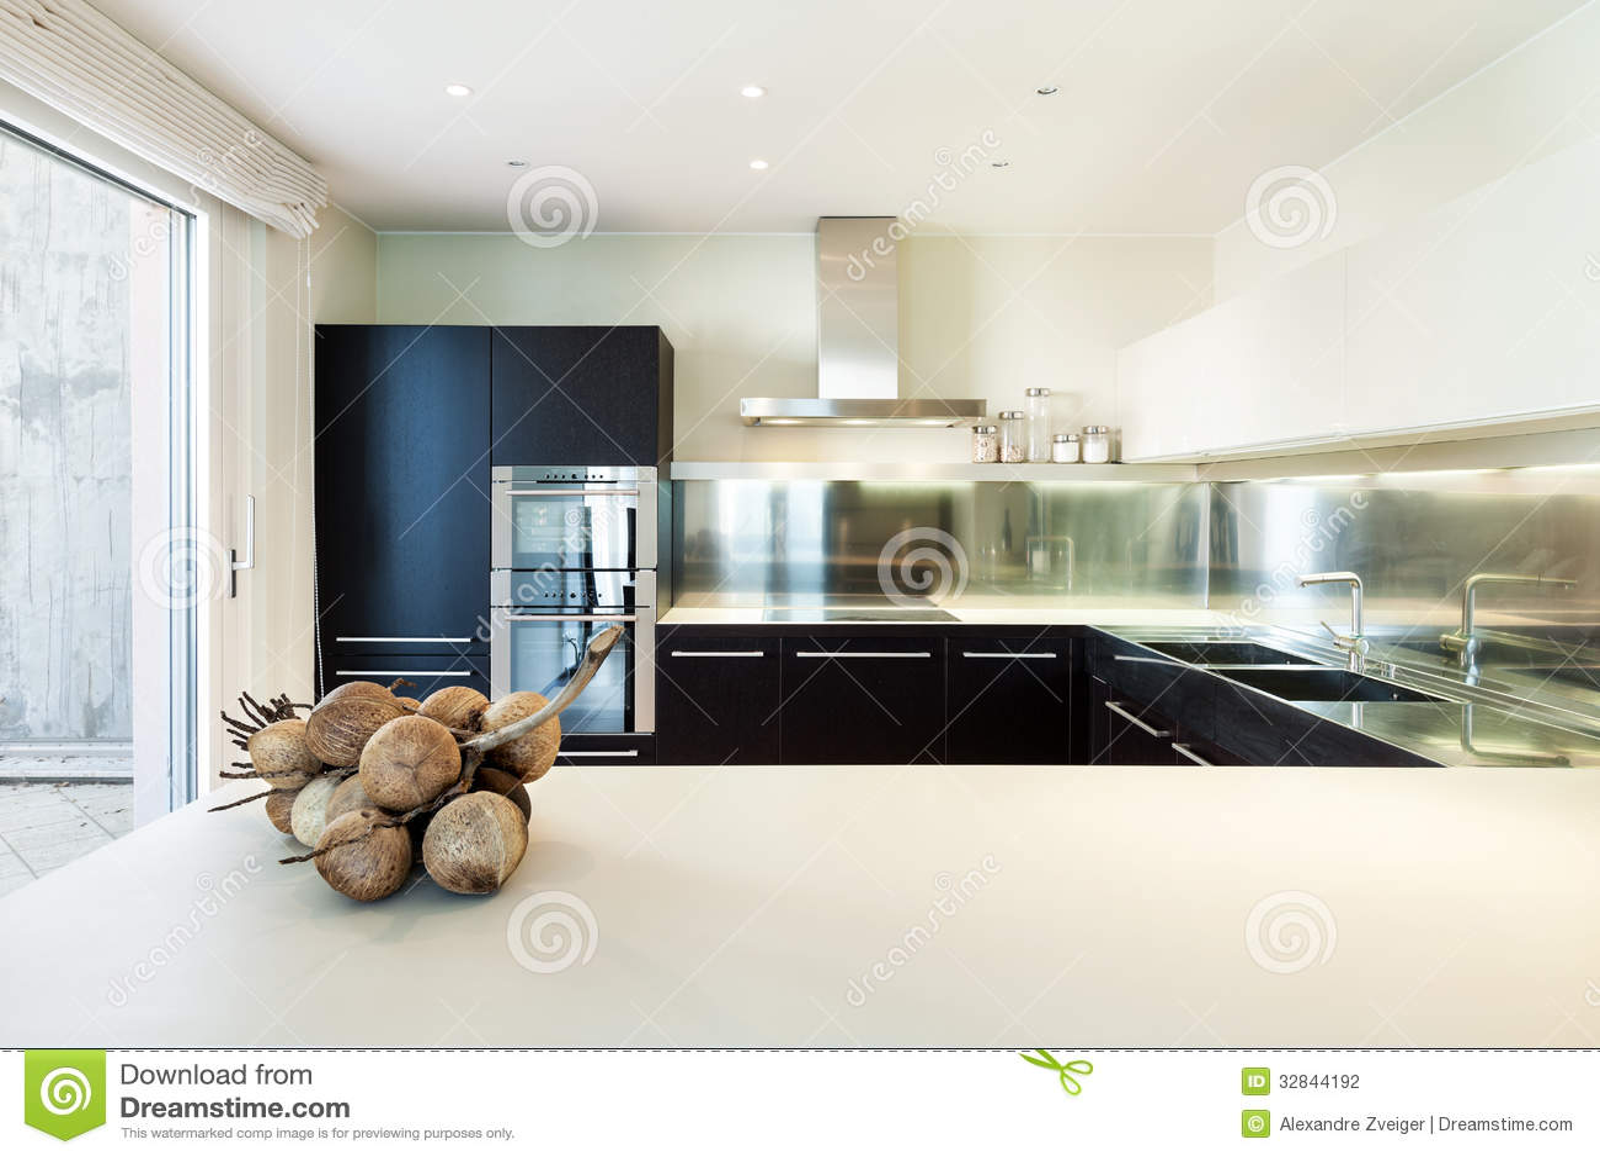 Luxury apartment kitchen - Apartment Interior Kitchen Luxury